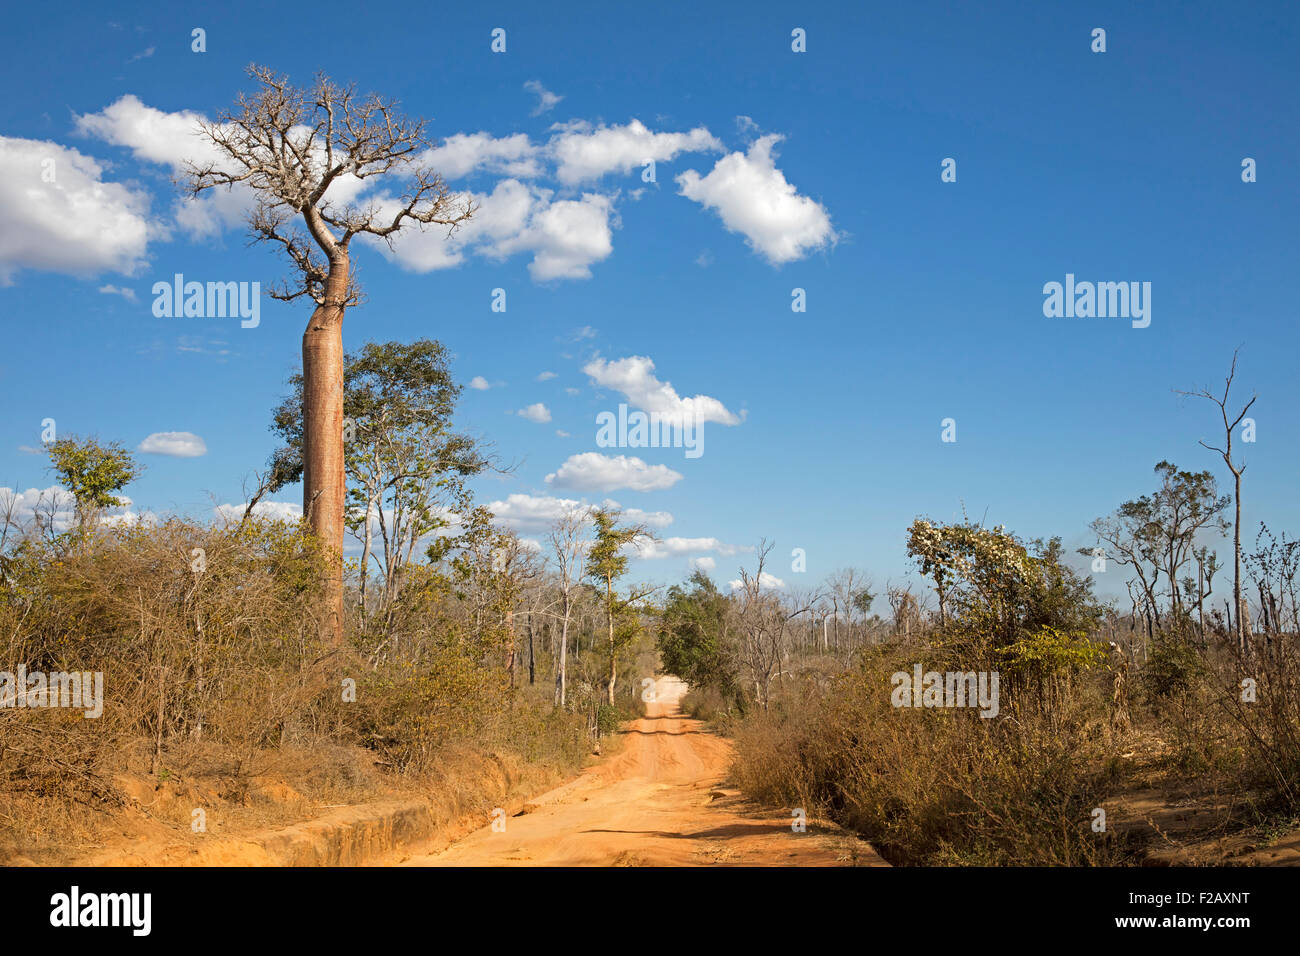 Dirt road from Belon'i Tsiribihina / Belo sur Tsiribihina / Belo - Tsiribihina to Morondava, Menabe, Madagascar, - Stock Image